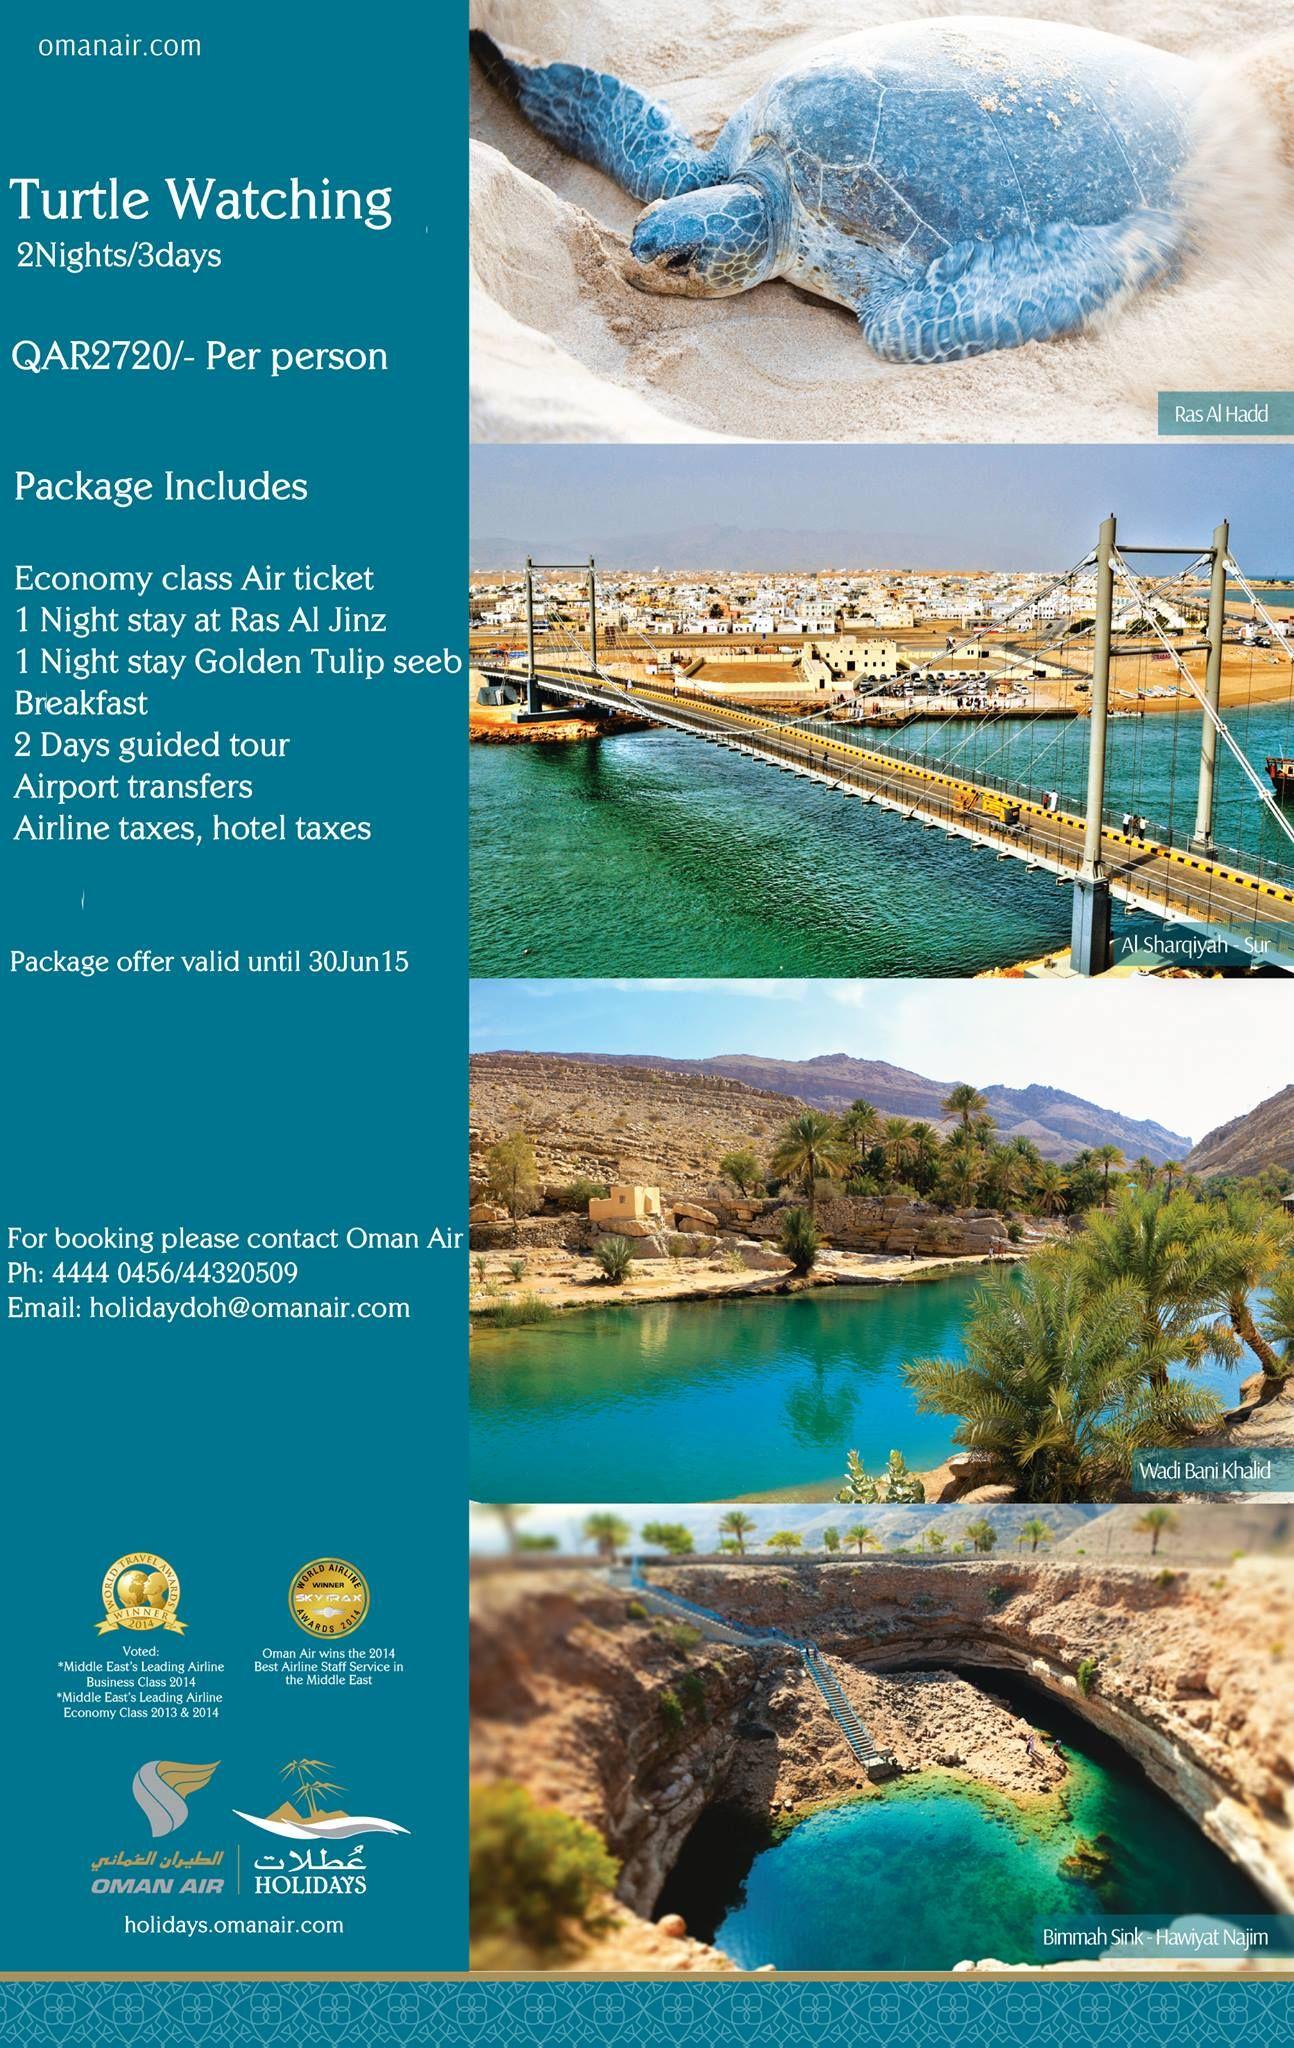 Oman Air Holidays Oman Hot Travel Stay The Night